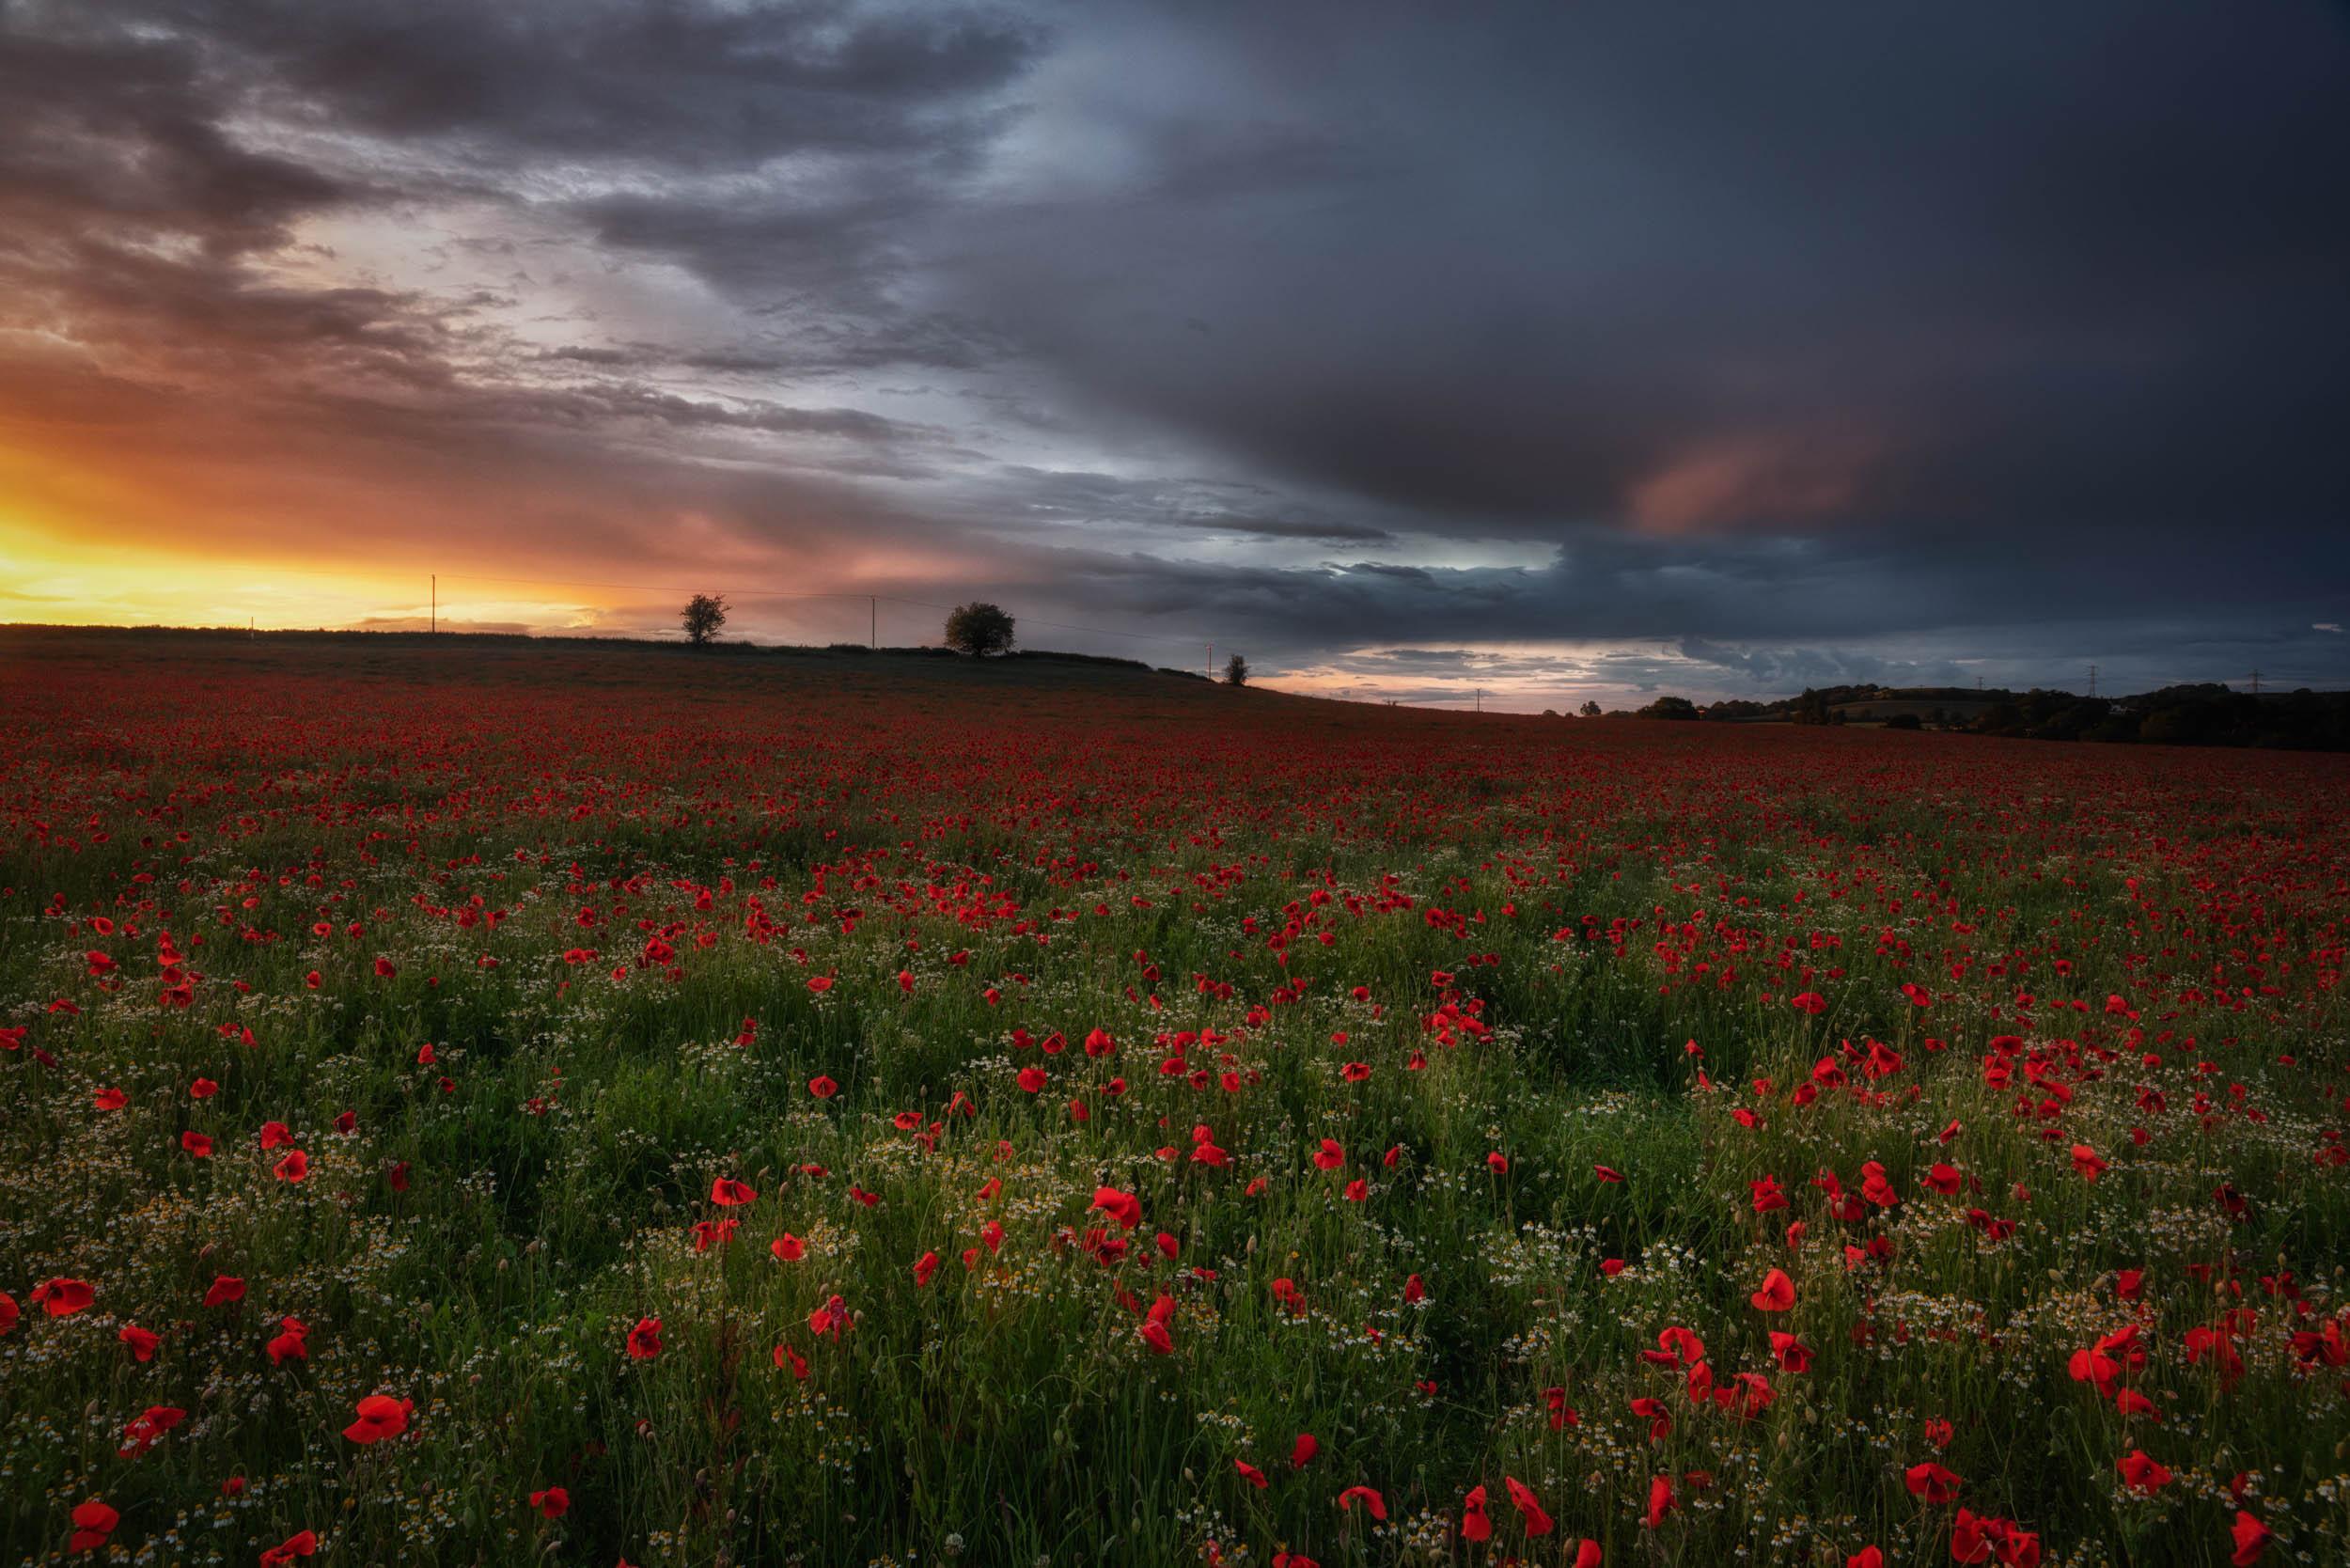 9 6 2019 - Poppy Field Sunset